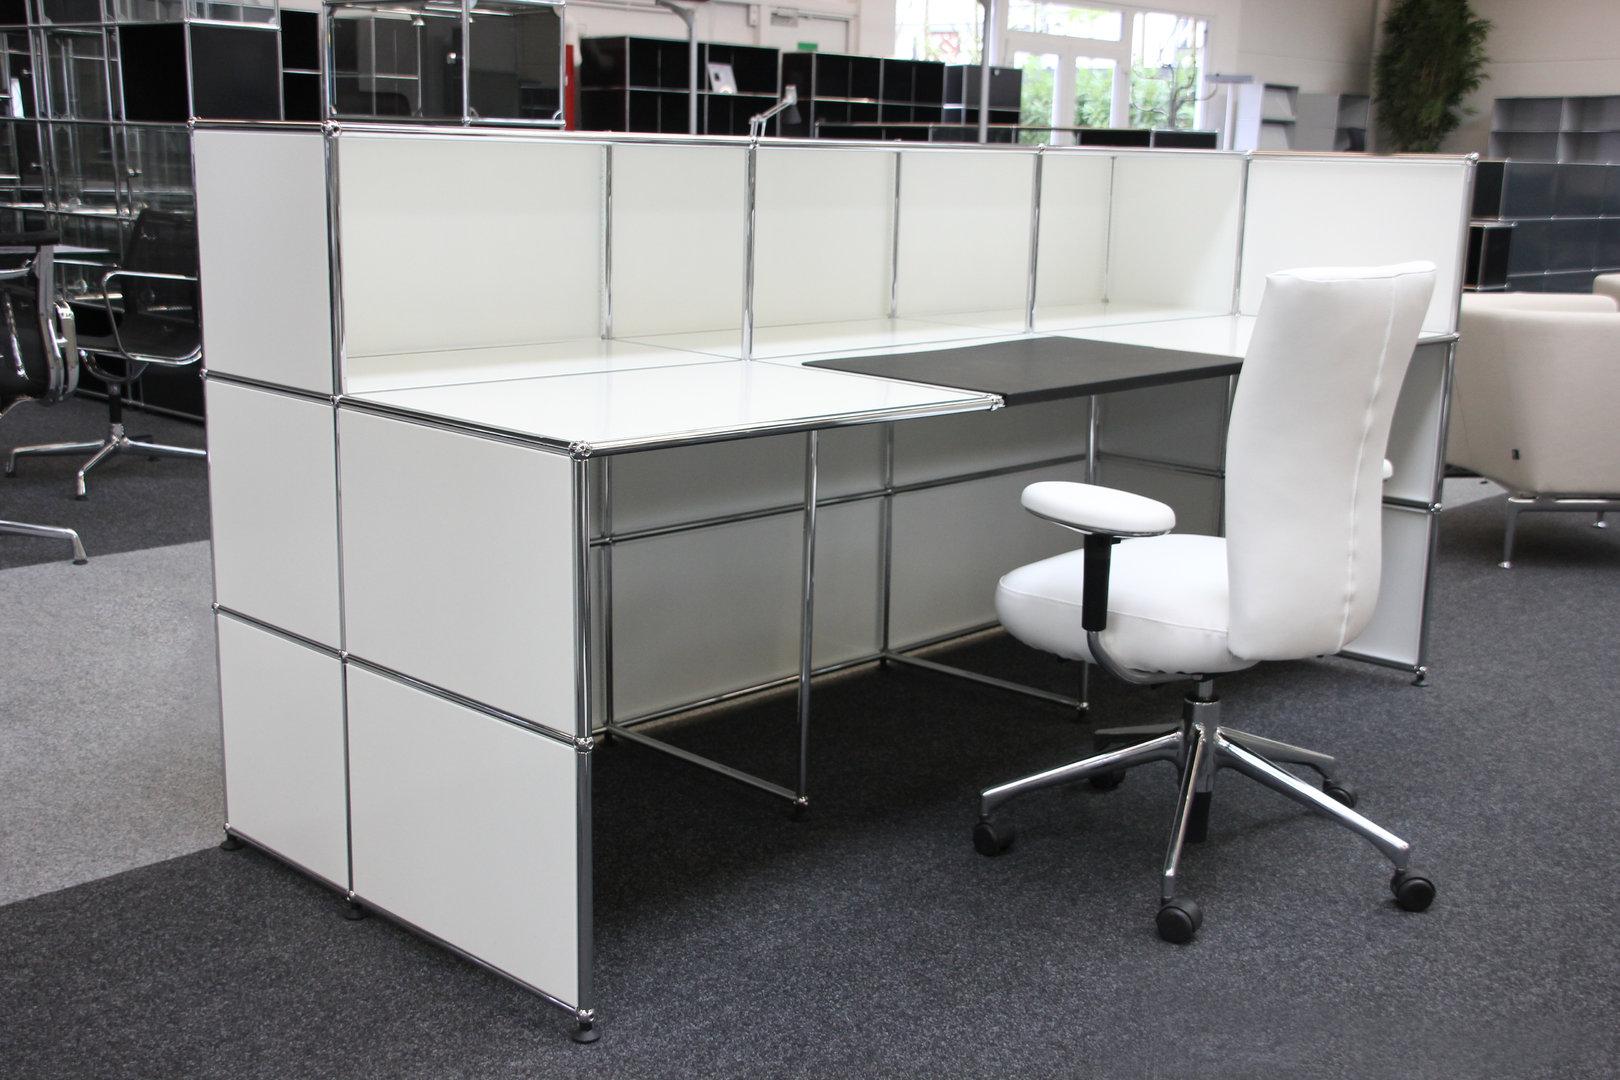 usm haller theke empfangstheke mit integriertem arbeitsplatz reinwei ral 9010 theken usm. Black Bedroom Furniture Sets. Home Design Ideas